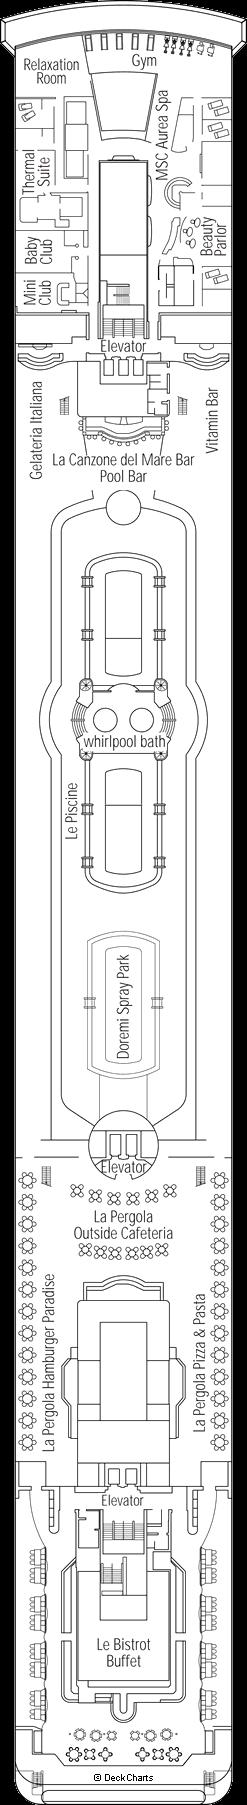 MSC Lirica: Vivaldi Deck